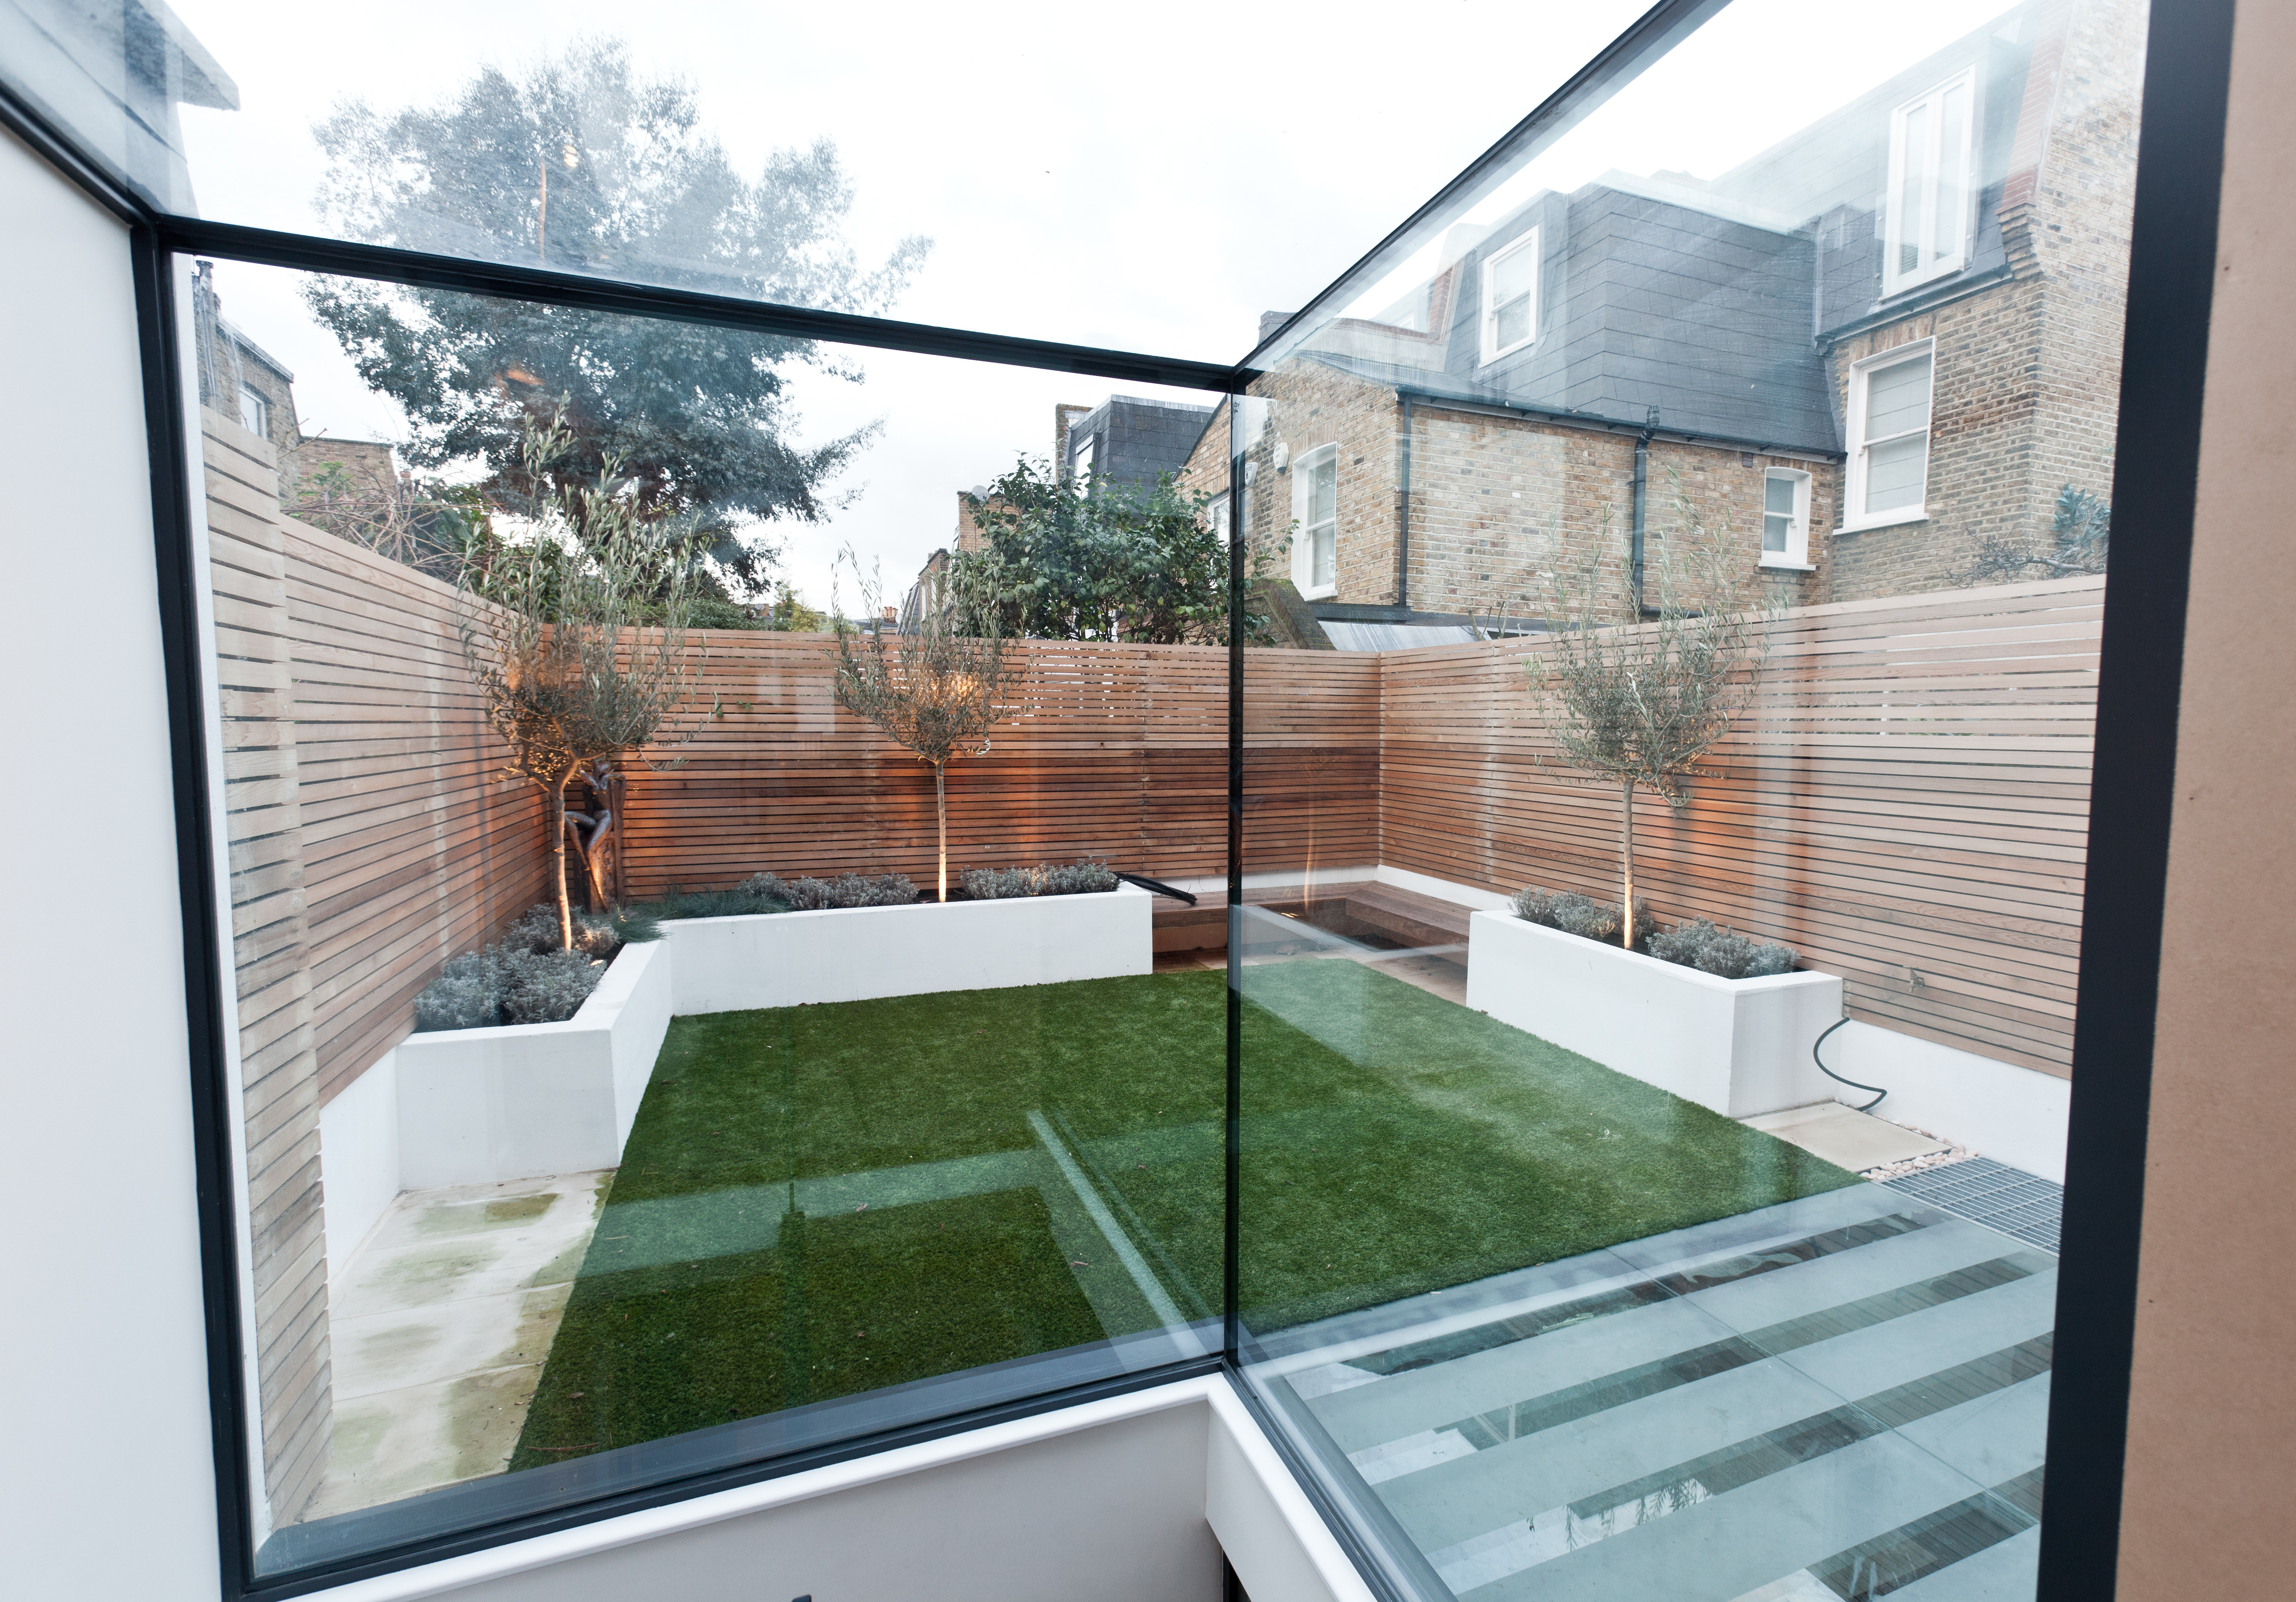 London basement extensions garden design shape for Garden conversion